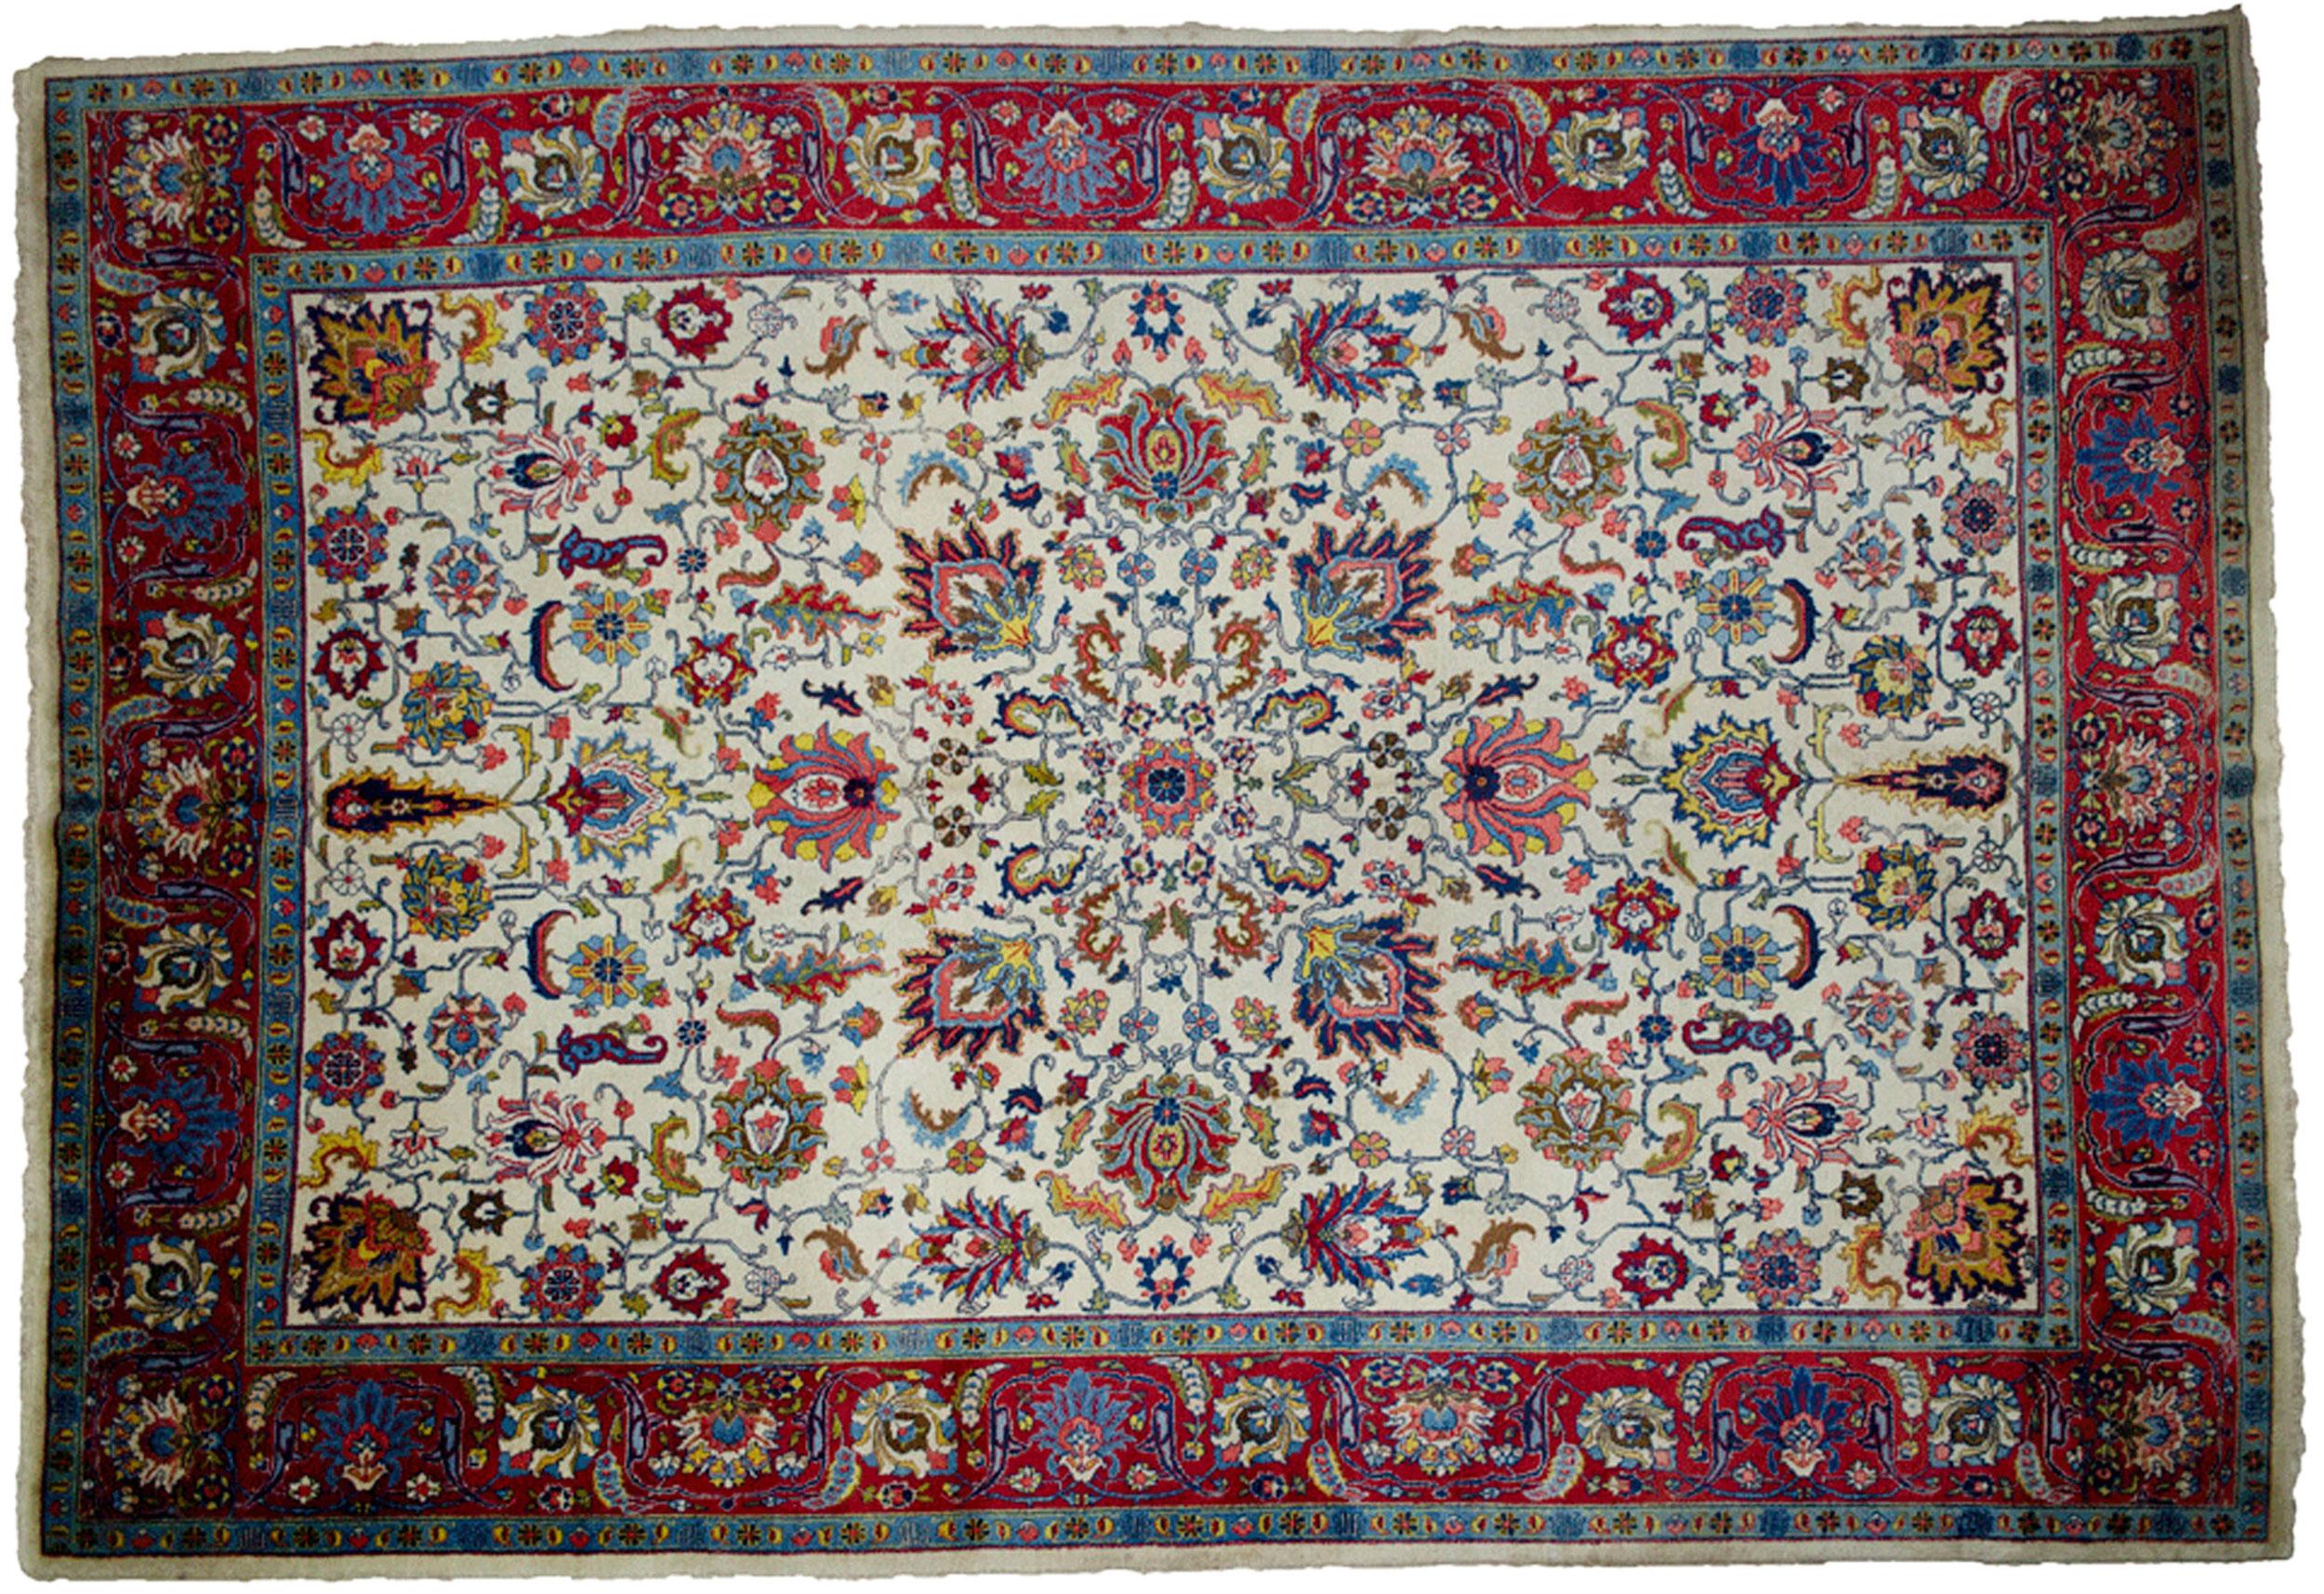 Antique Tabriz Carpet 396x275cm